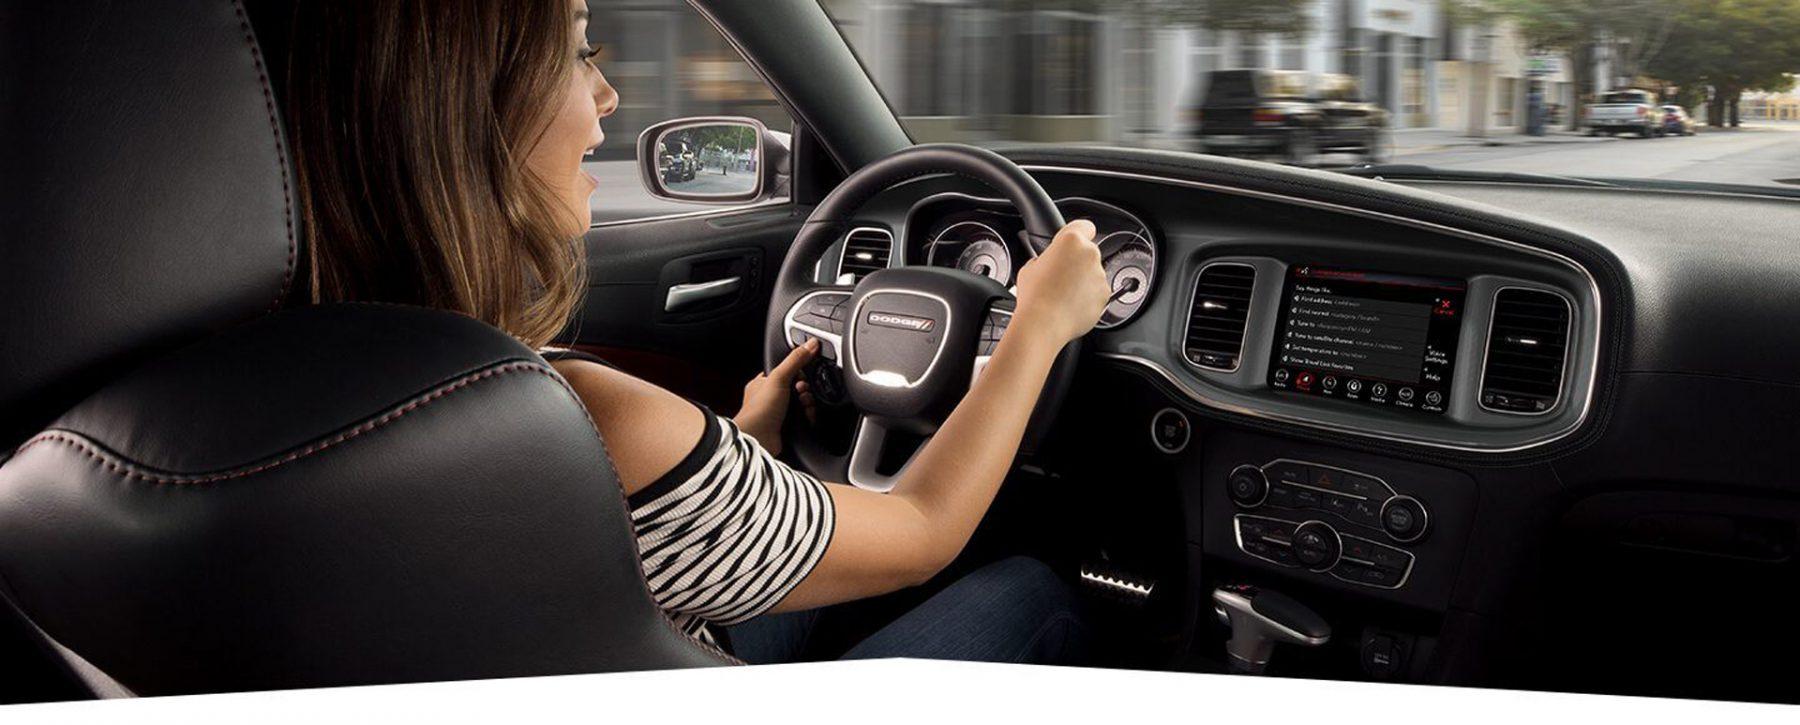 Dodge Charger radio display